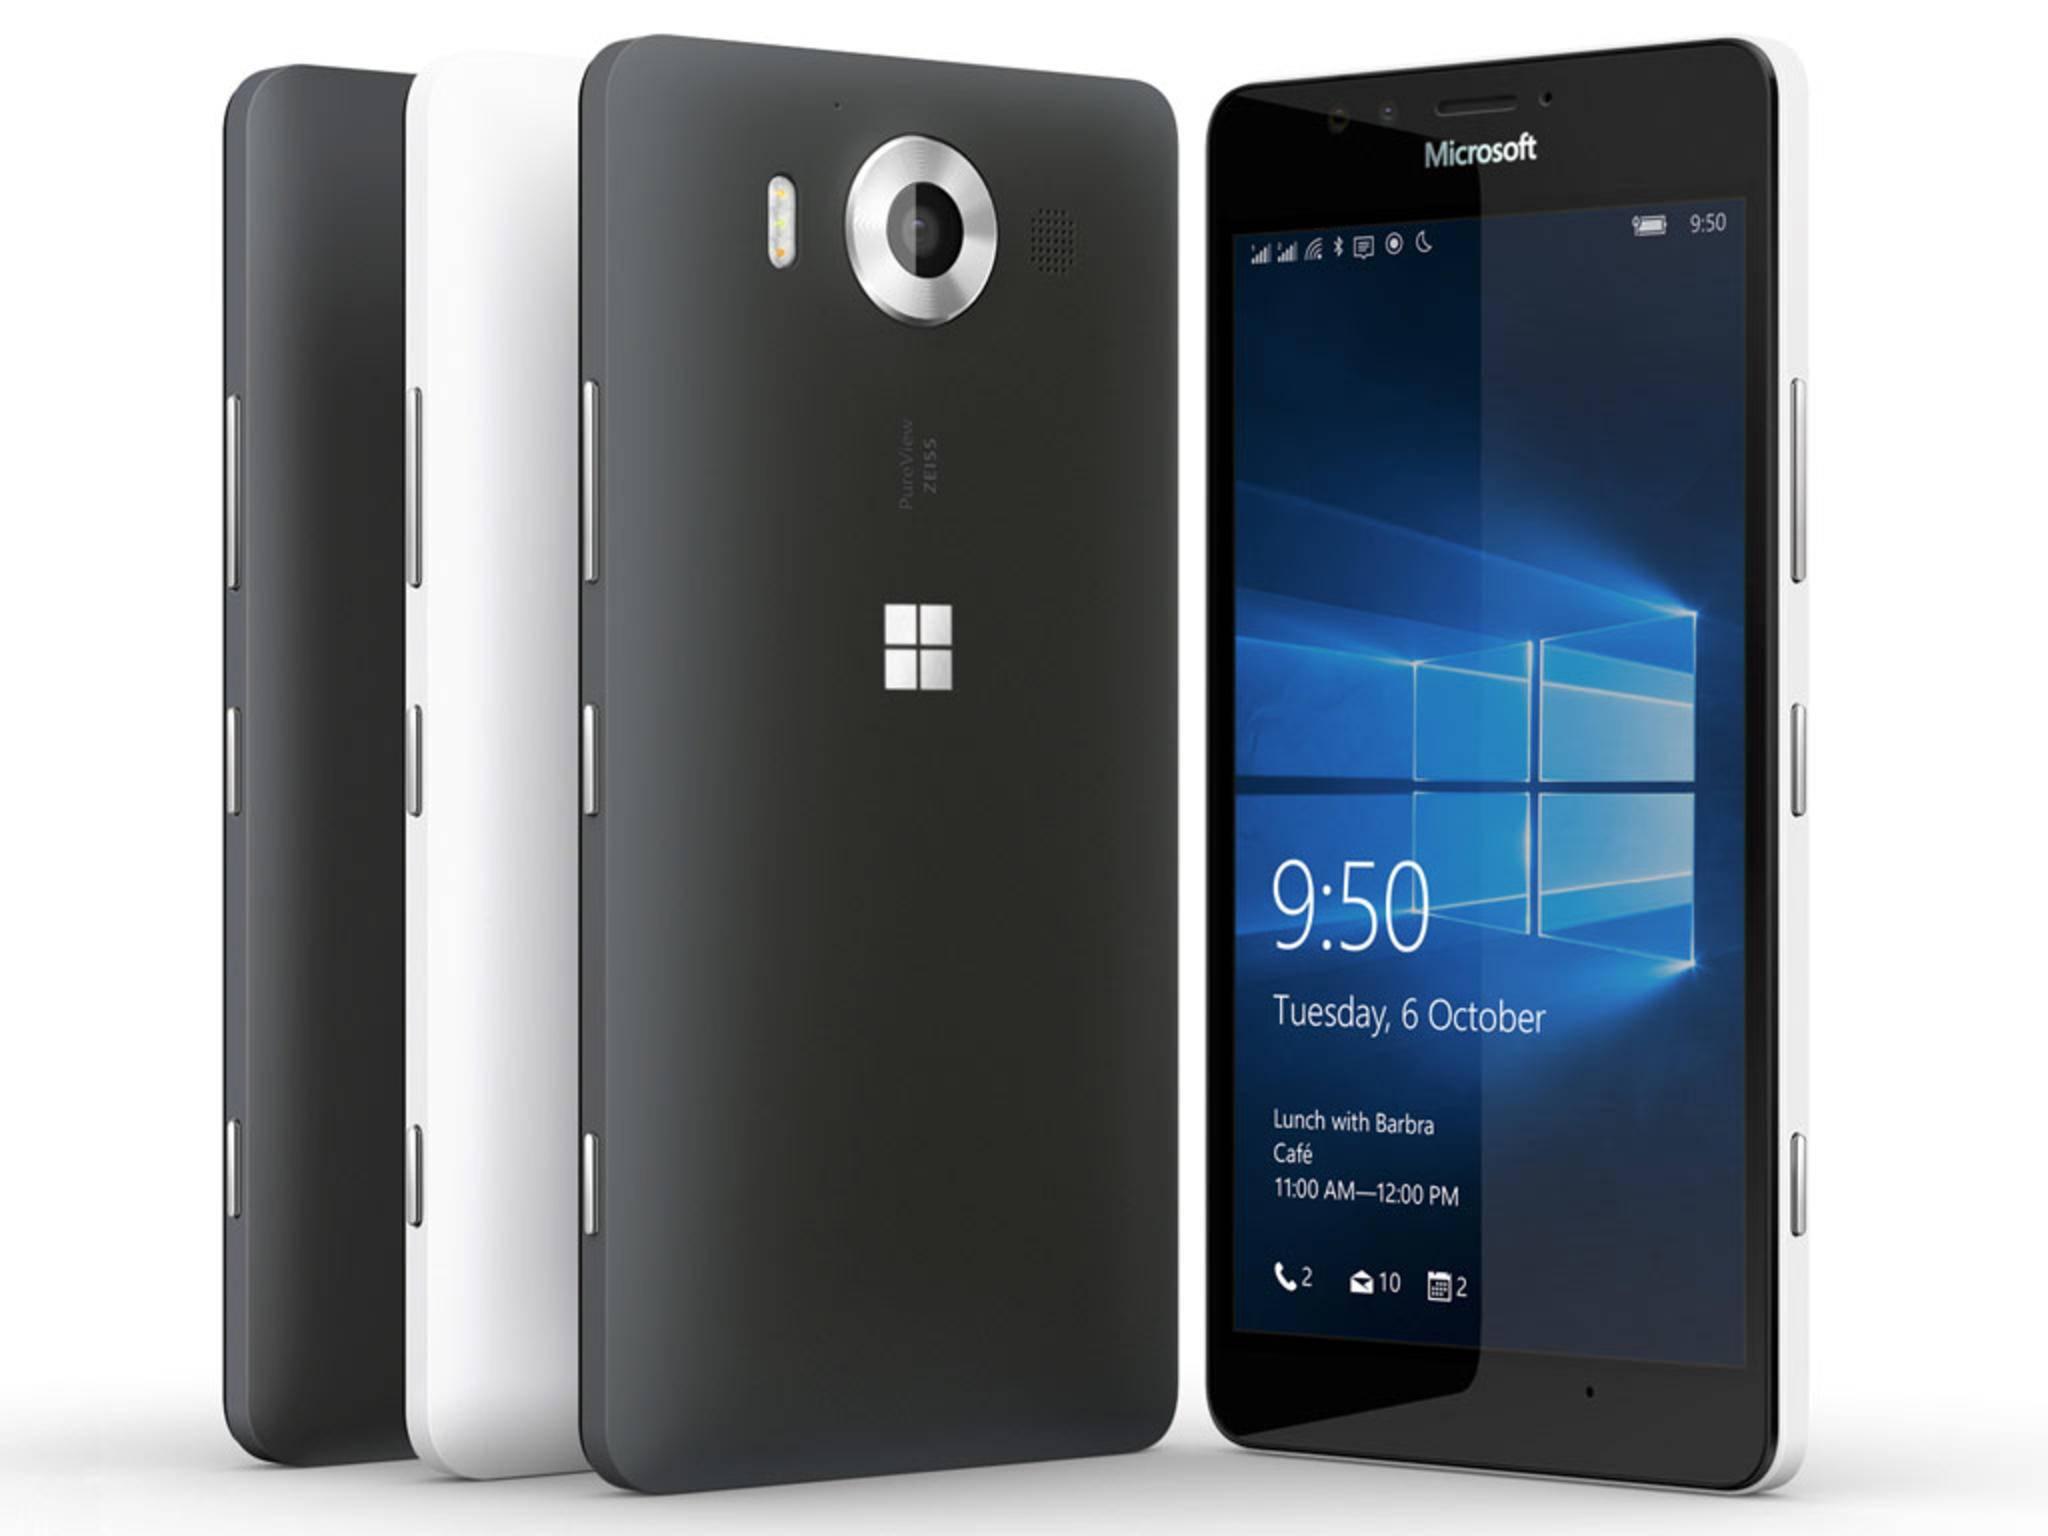 Microsoft enthüllte seine Smartphone-Flaggschiffe Lumia 950 und Lumia 950 XL.